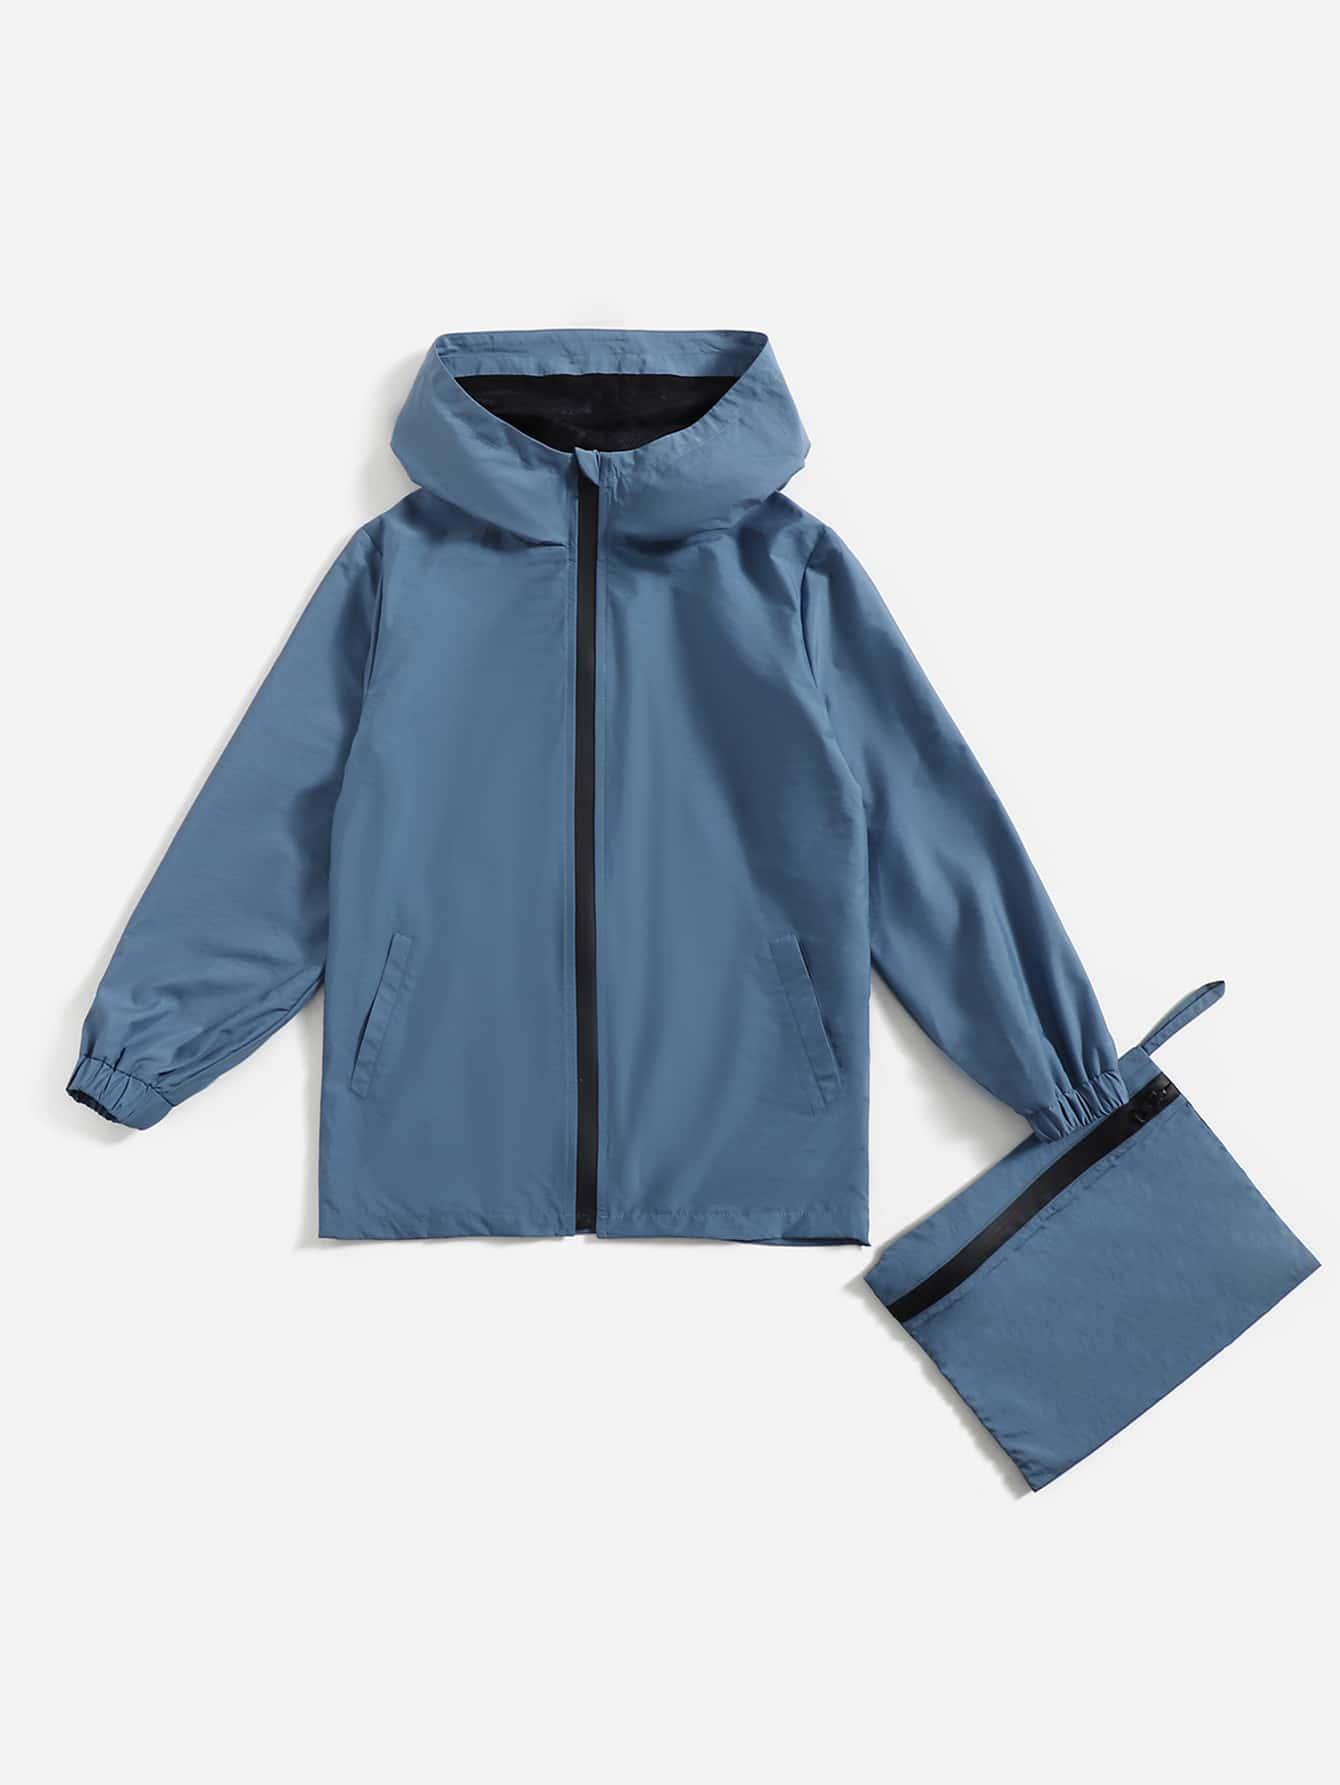 Boys Zipper Up Hooded Windbreaker Jacket With Bag